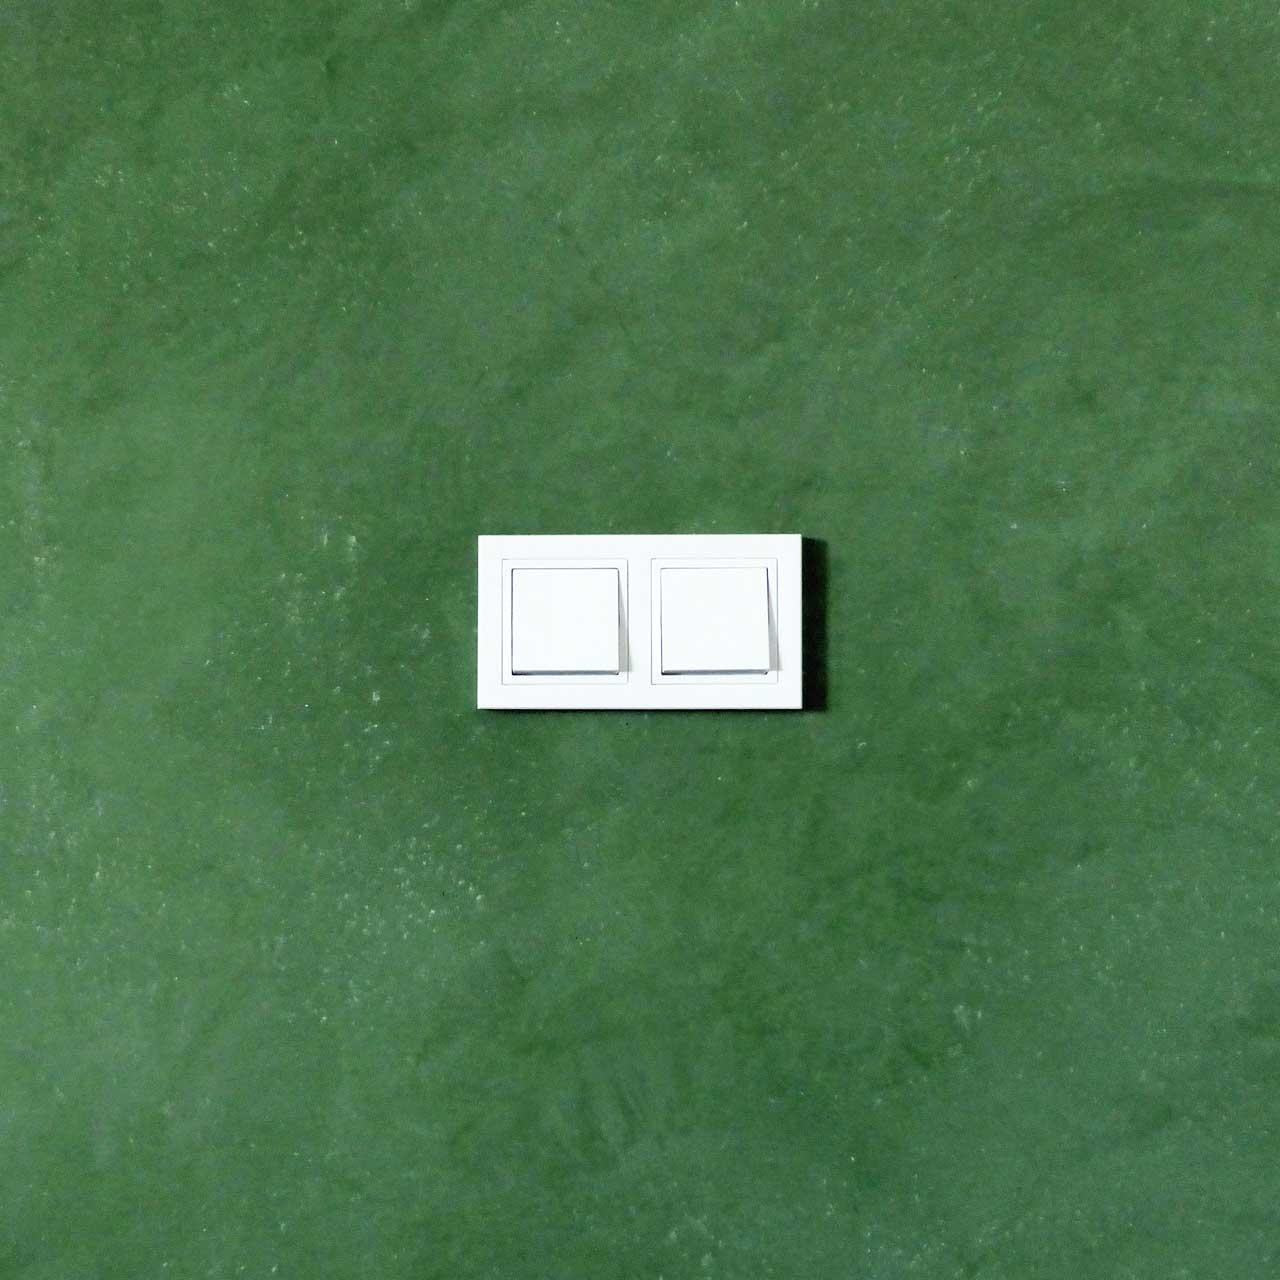 KalkManufaktur Premium Sumpfkalk Marmorputz chromoxidgrün